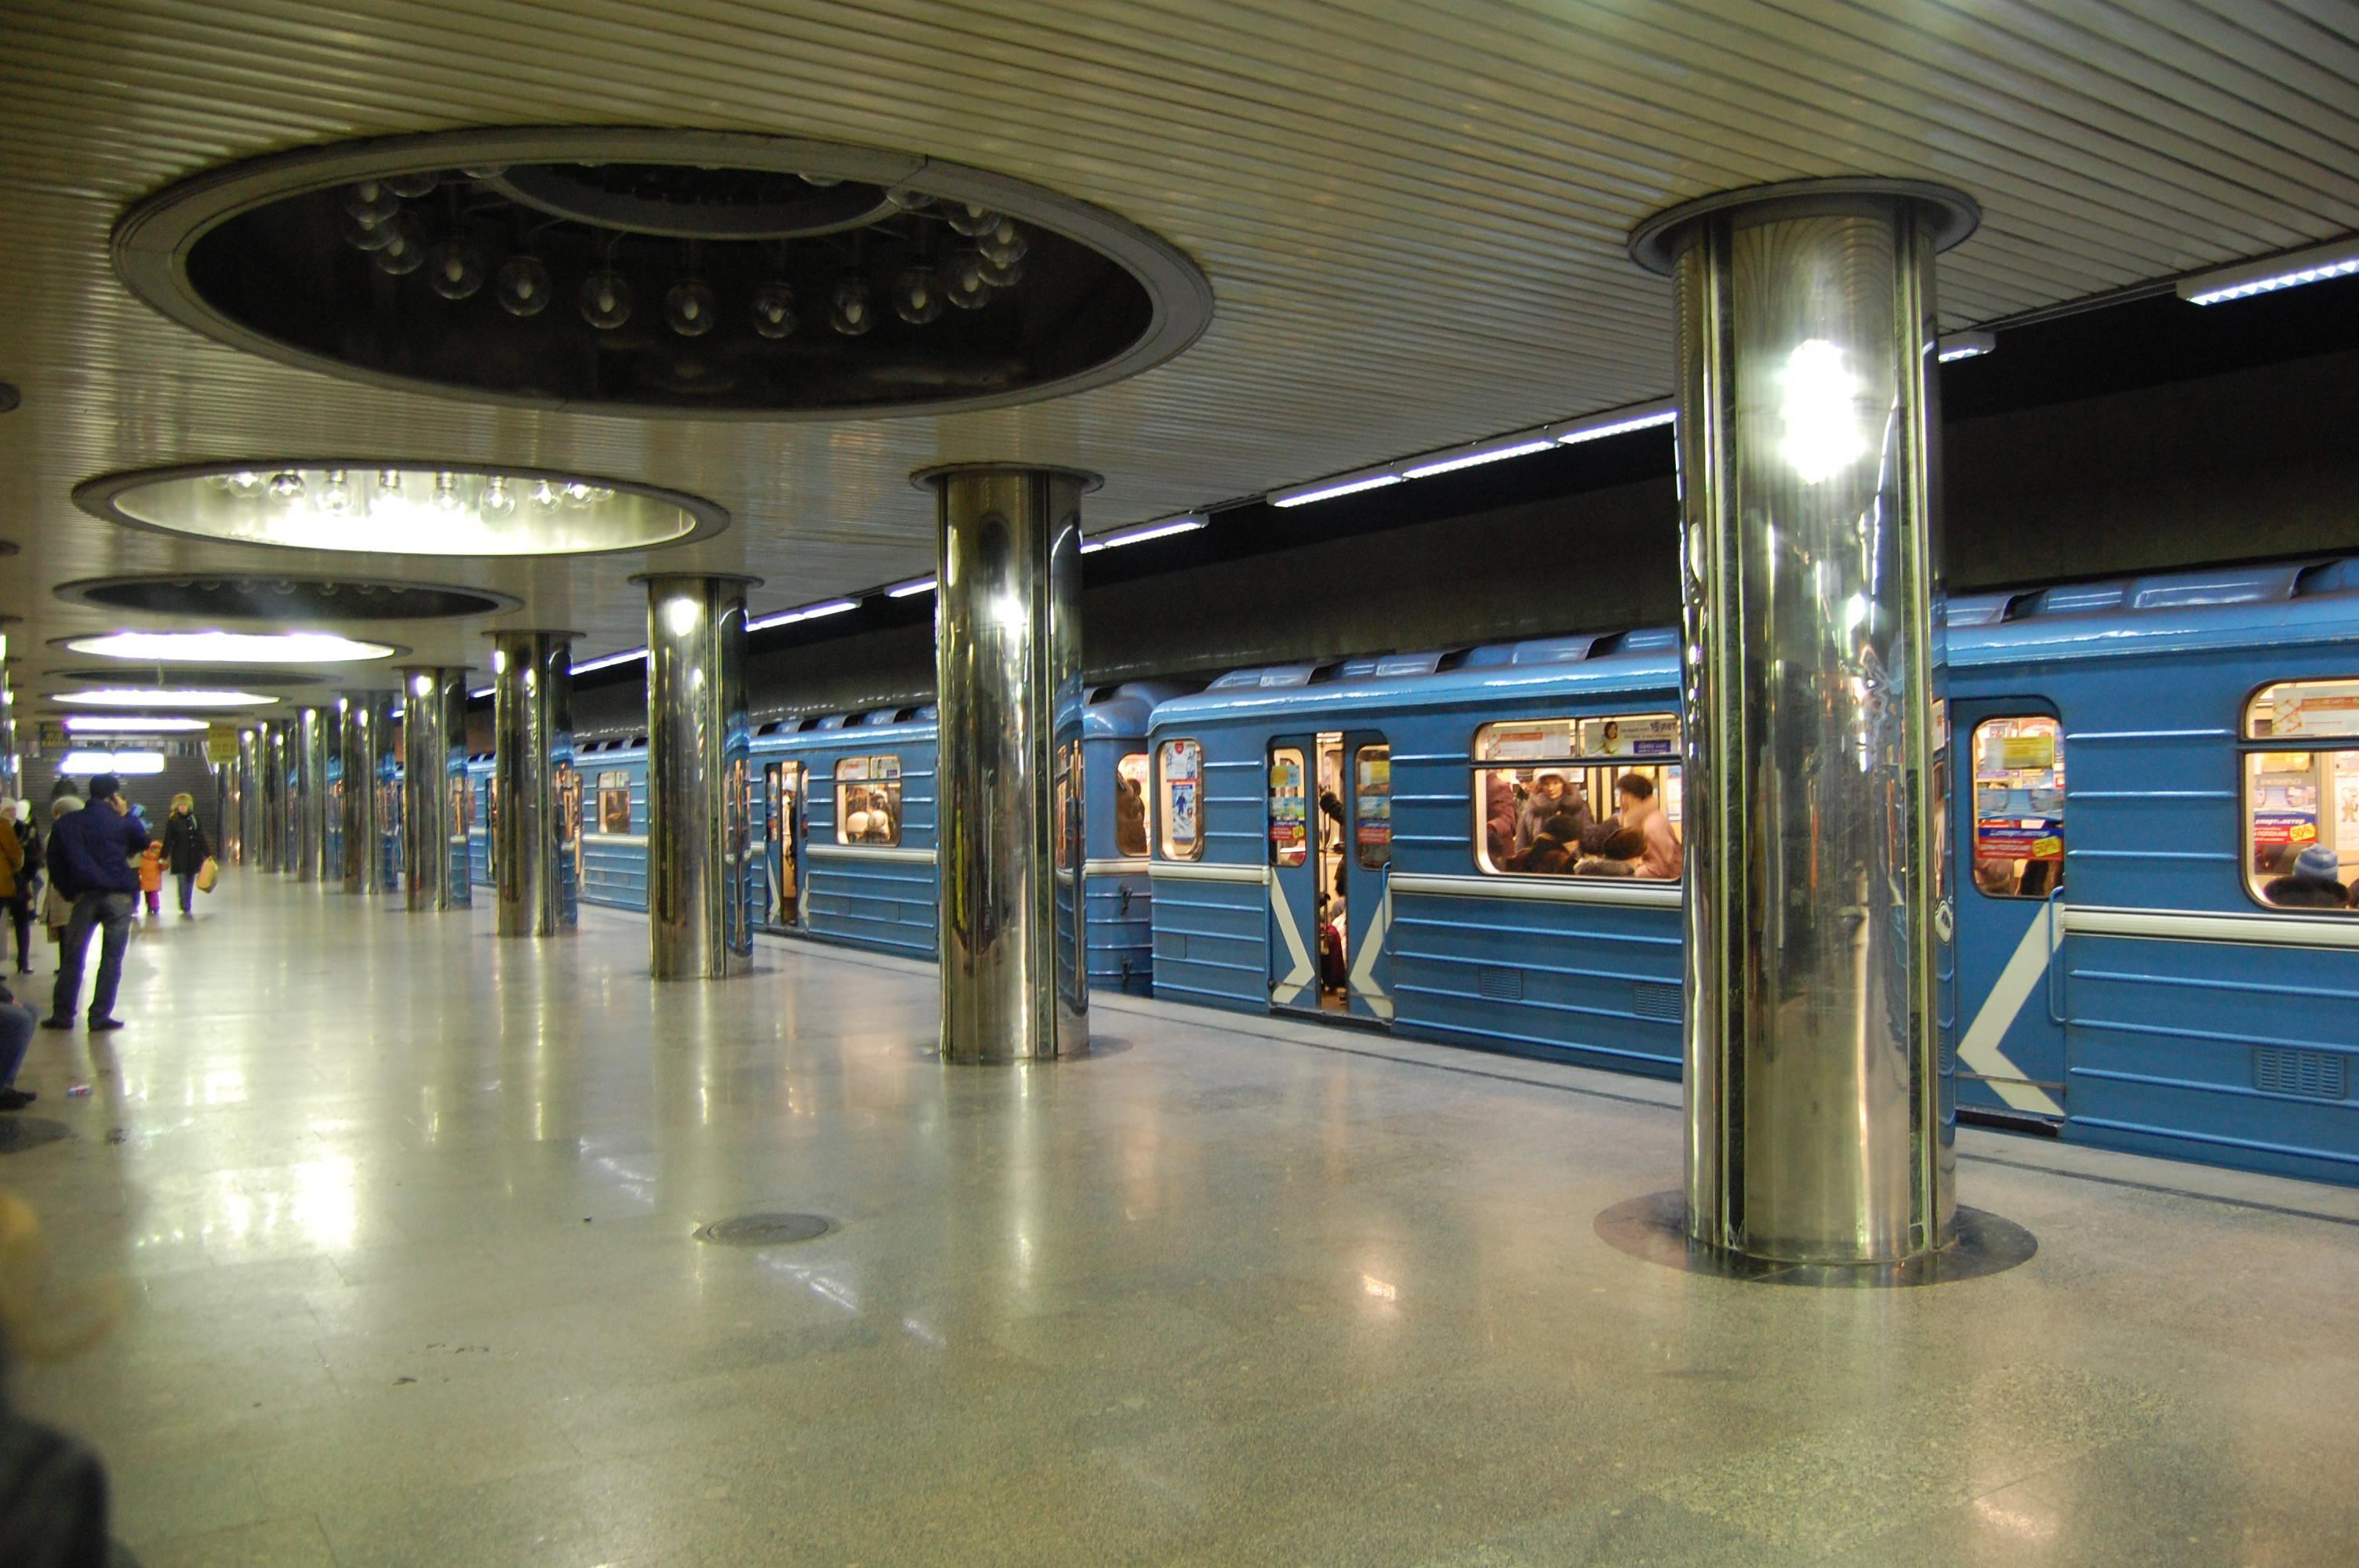 На Замоскворецкой линии метро появится Wi-Fi